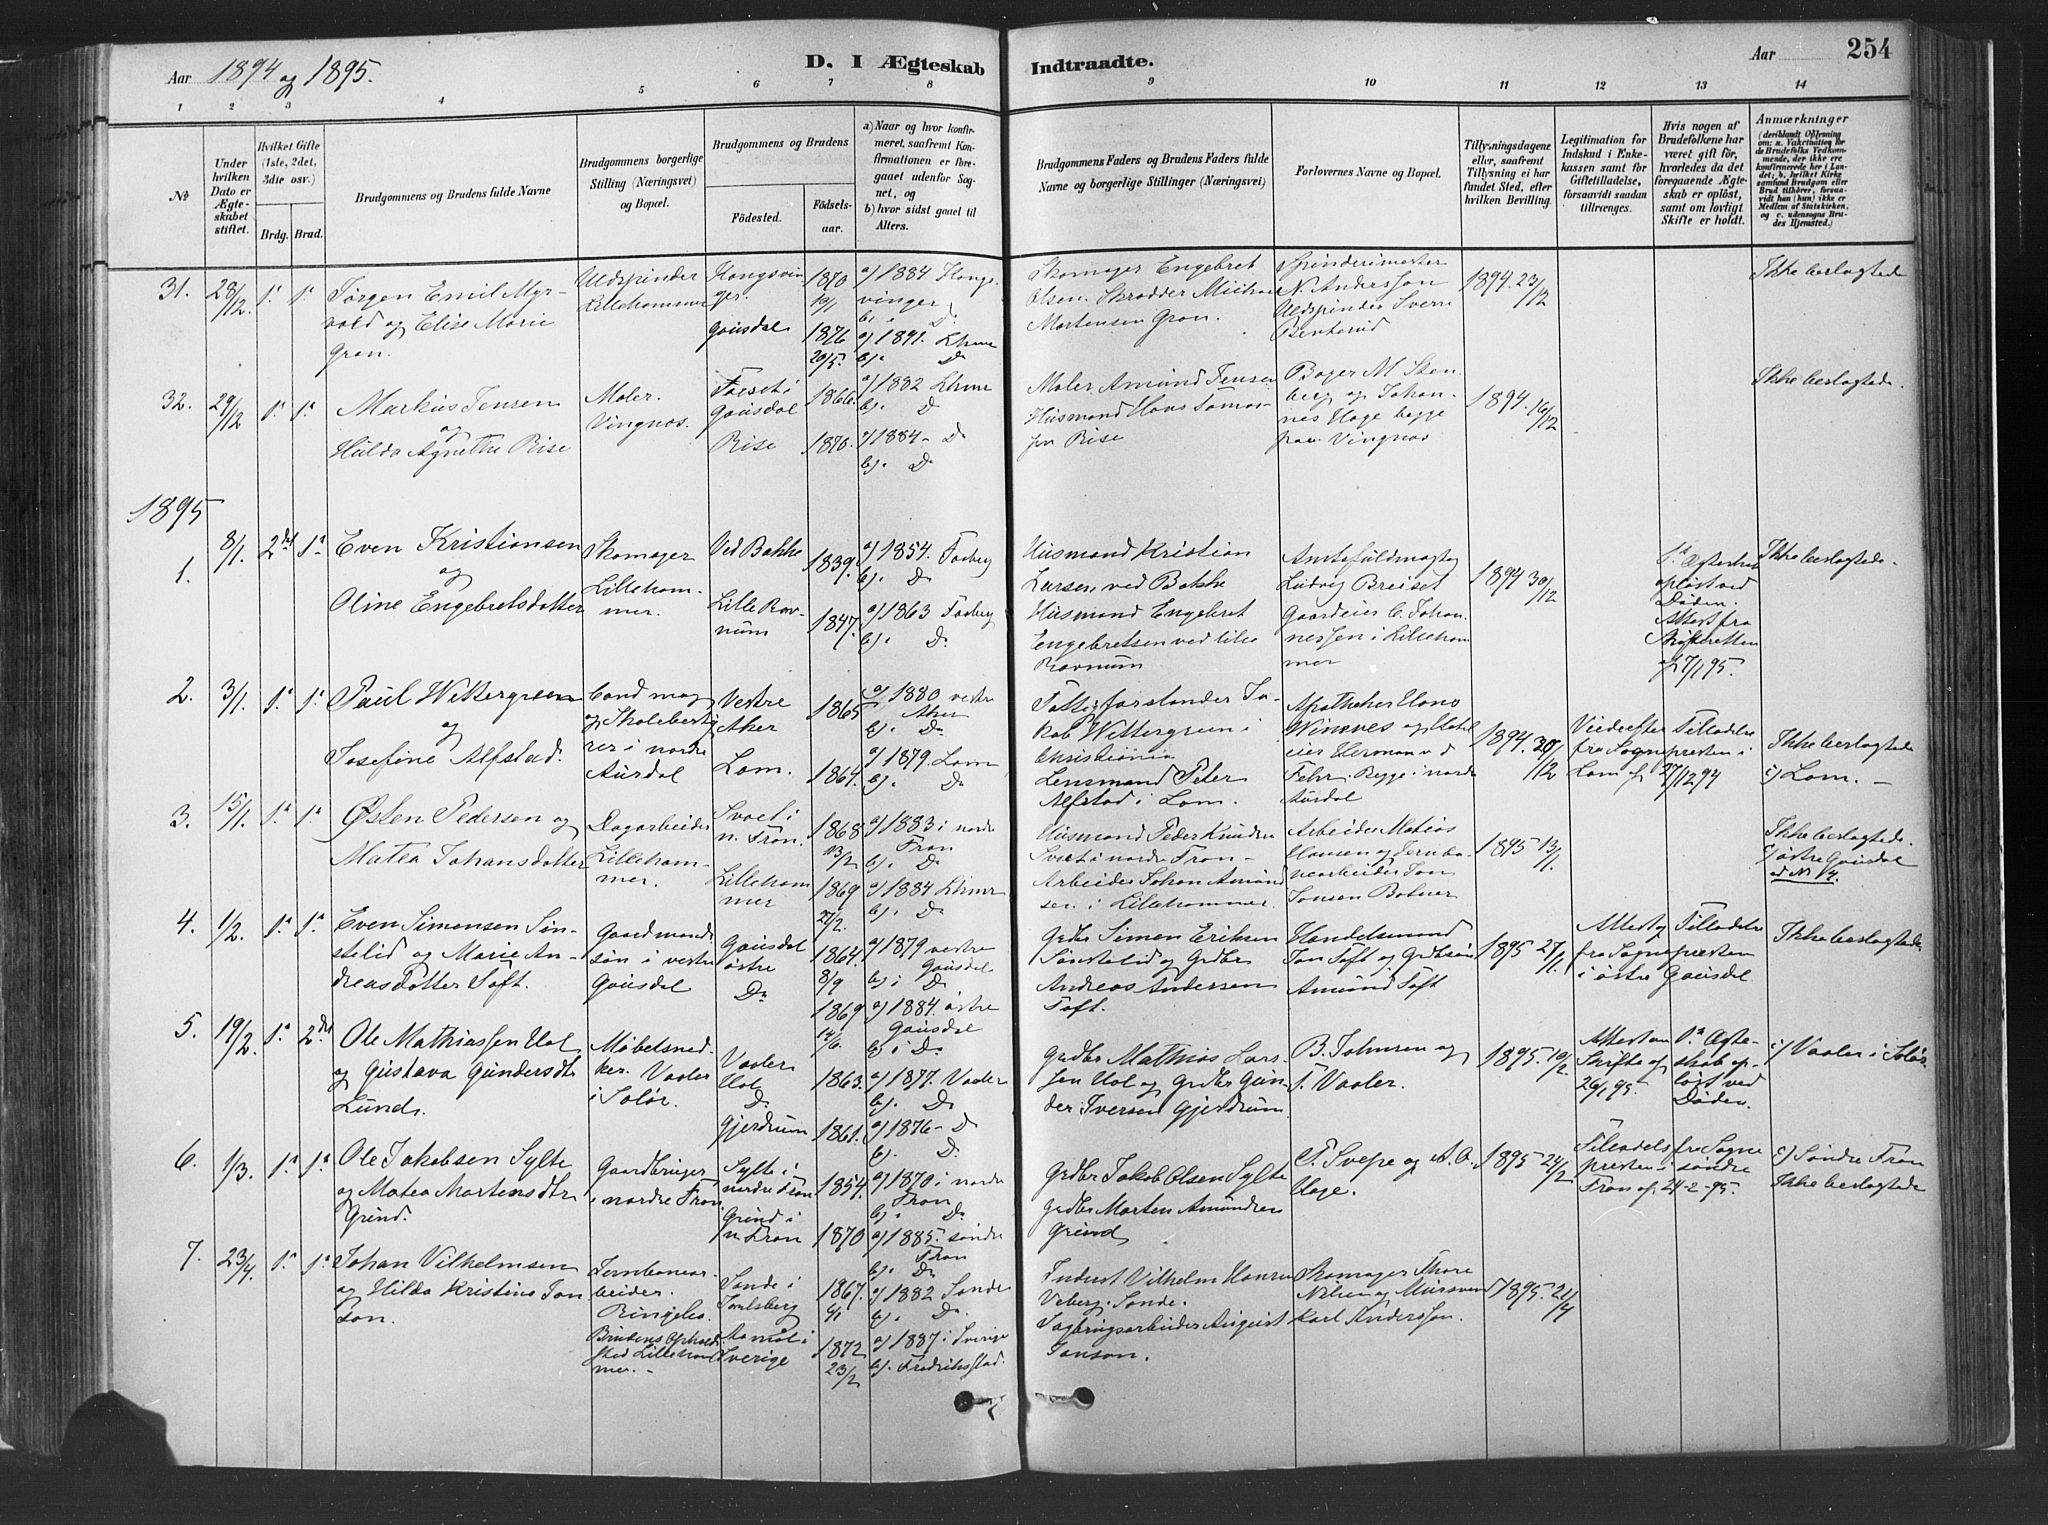 SAH, Fåberg prestekontor, H/Ha/Haa/L0010: Parish register (official) no. 10, 1879-1900, p. 254